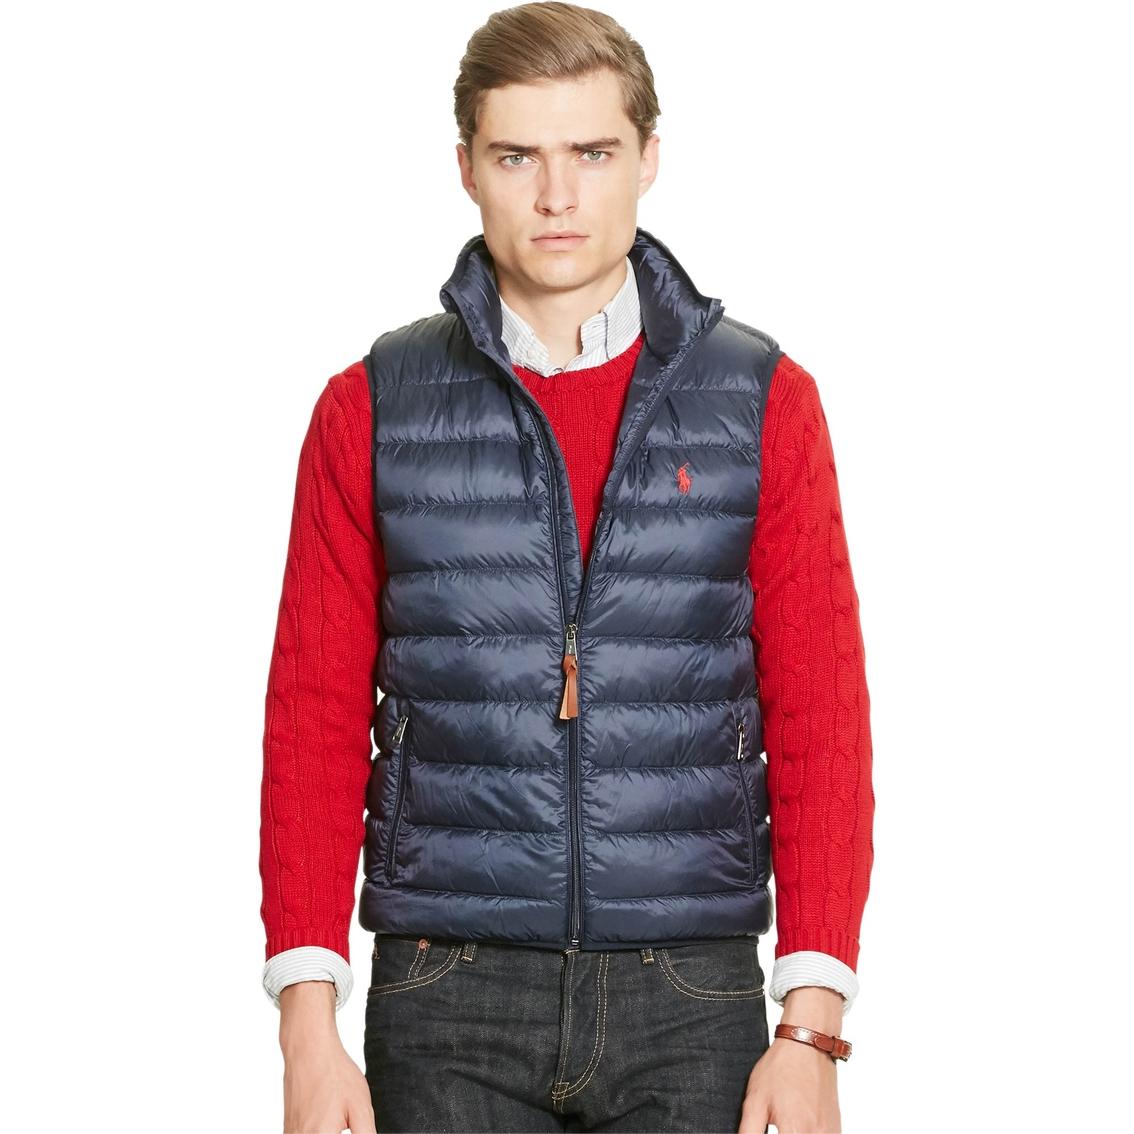 Polo Ralph Lauren Packable Down Vest   Polo Ralph Lauren ...